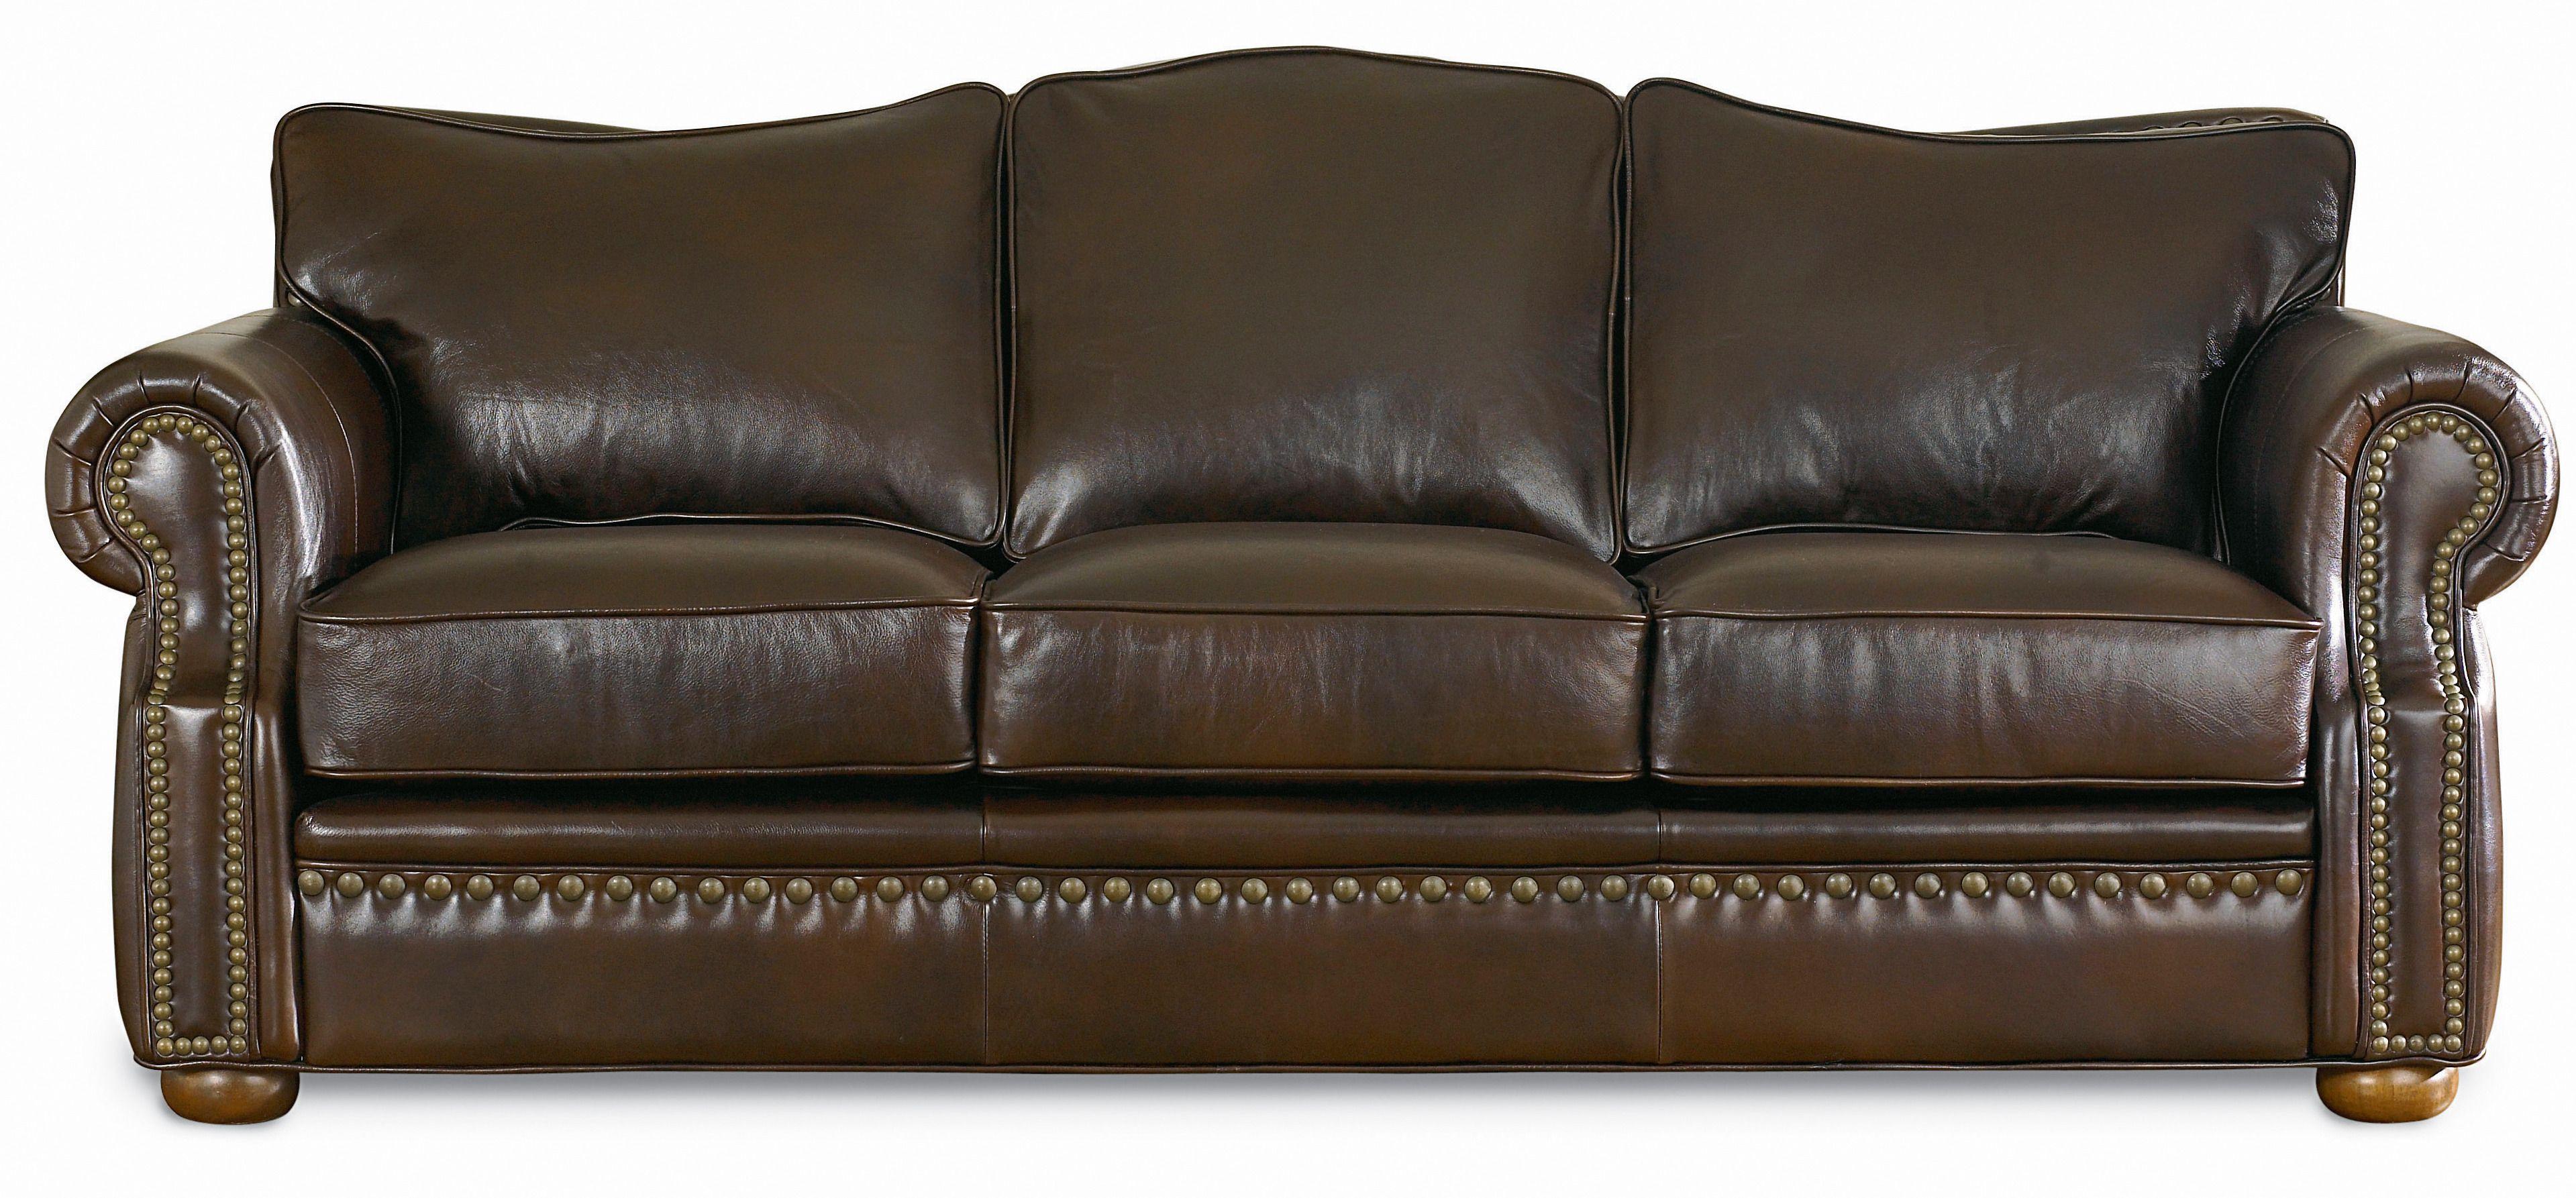 Wondrous Pin By Dewa Sia On E Rheumatism Net Sofa Furniture Inzonedesignstudio Interior Chair Design Inzonedesignstudiocom